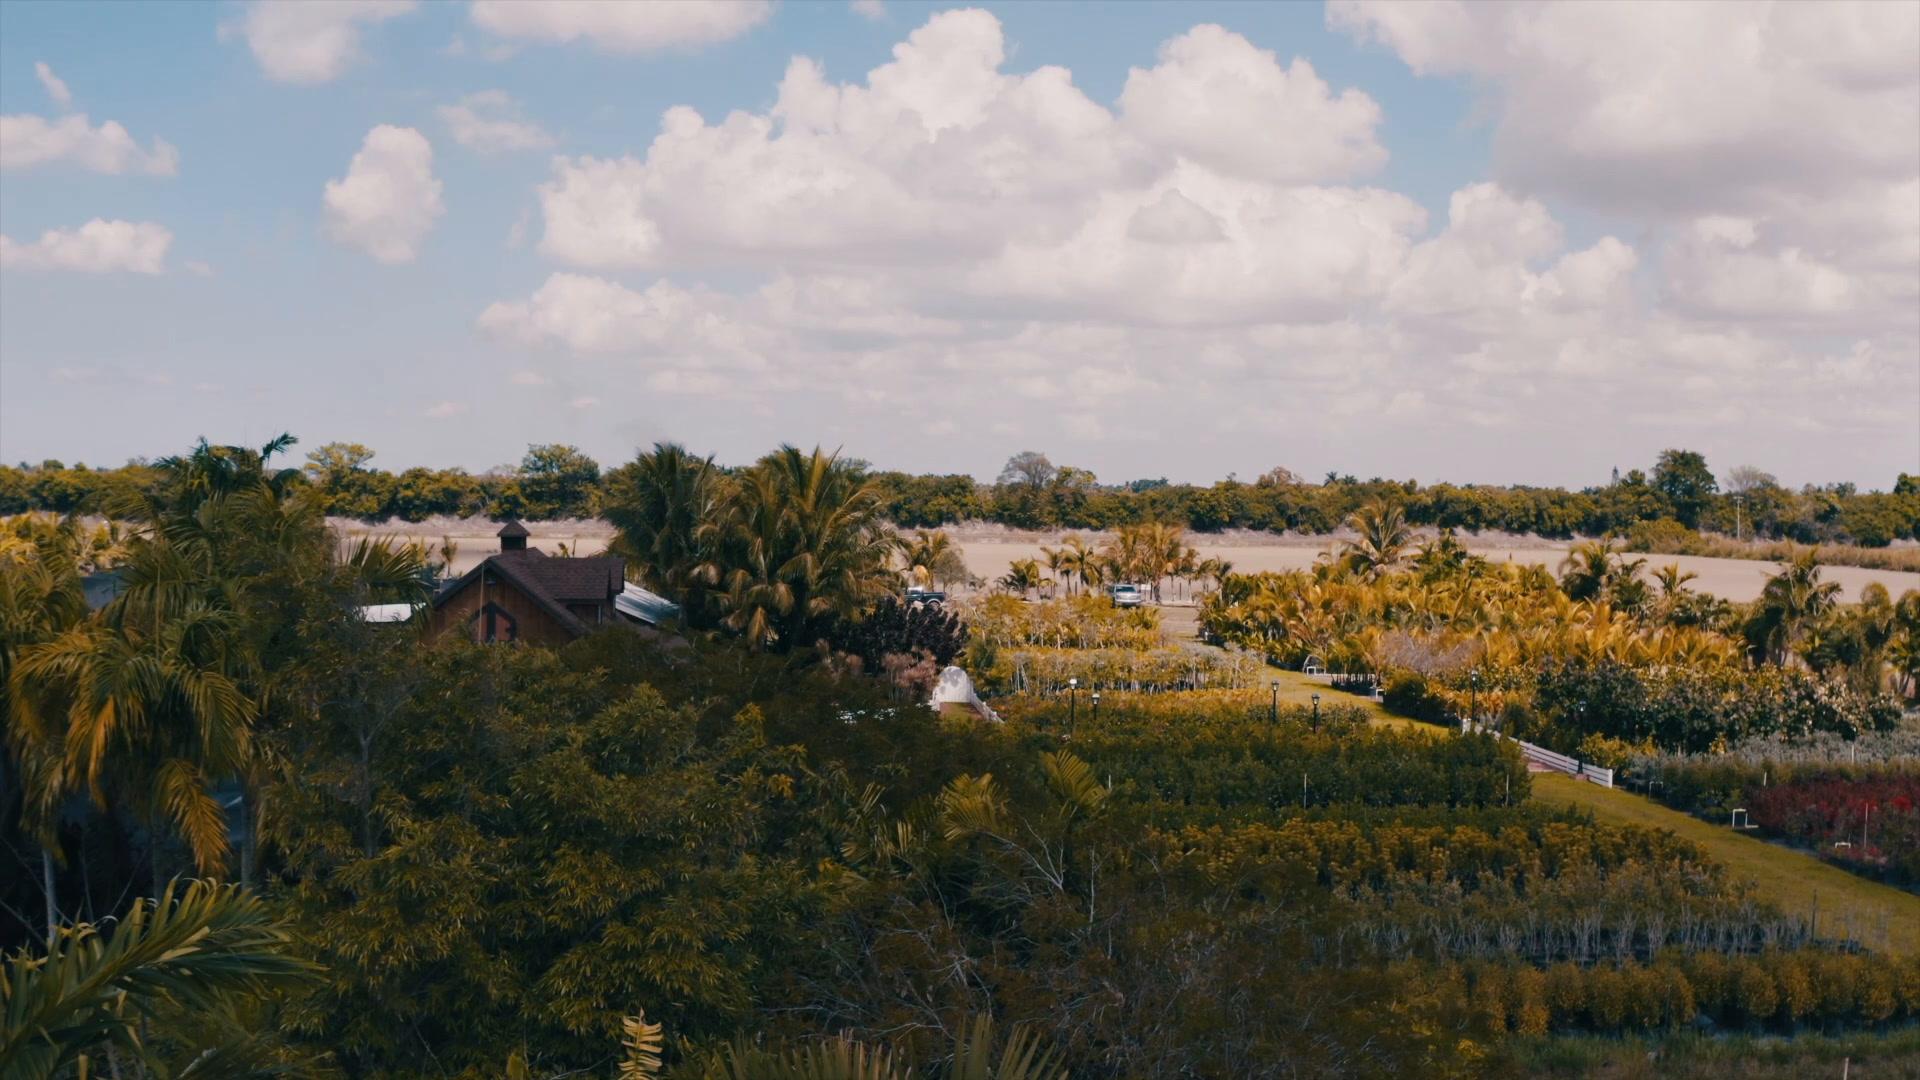 David + Michelle | Miami, Florida | Redland Farm Life